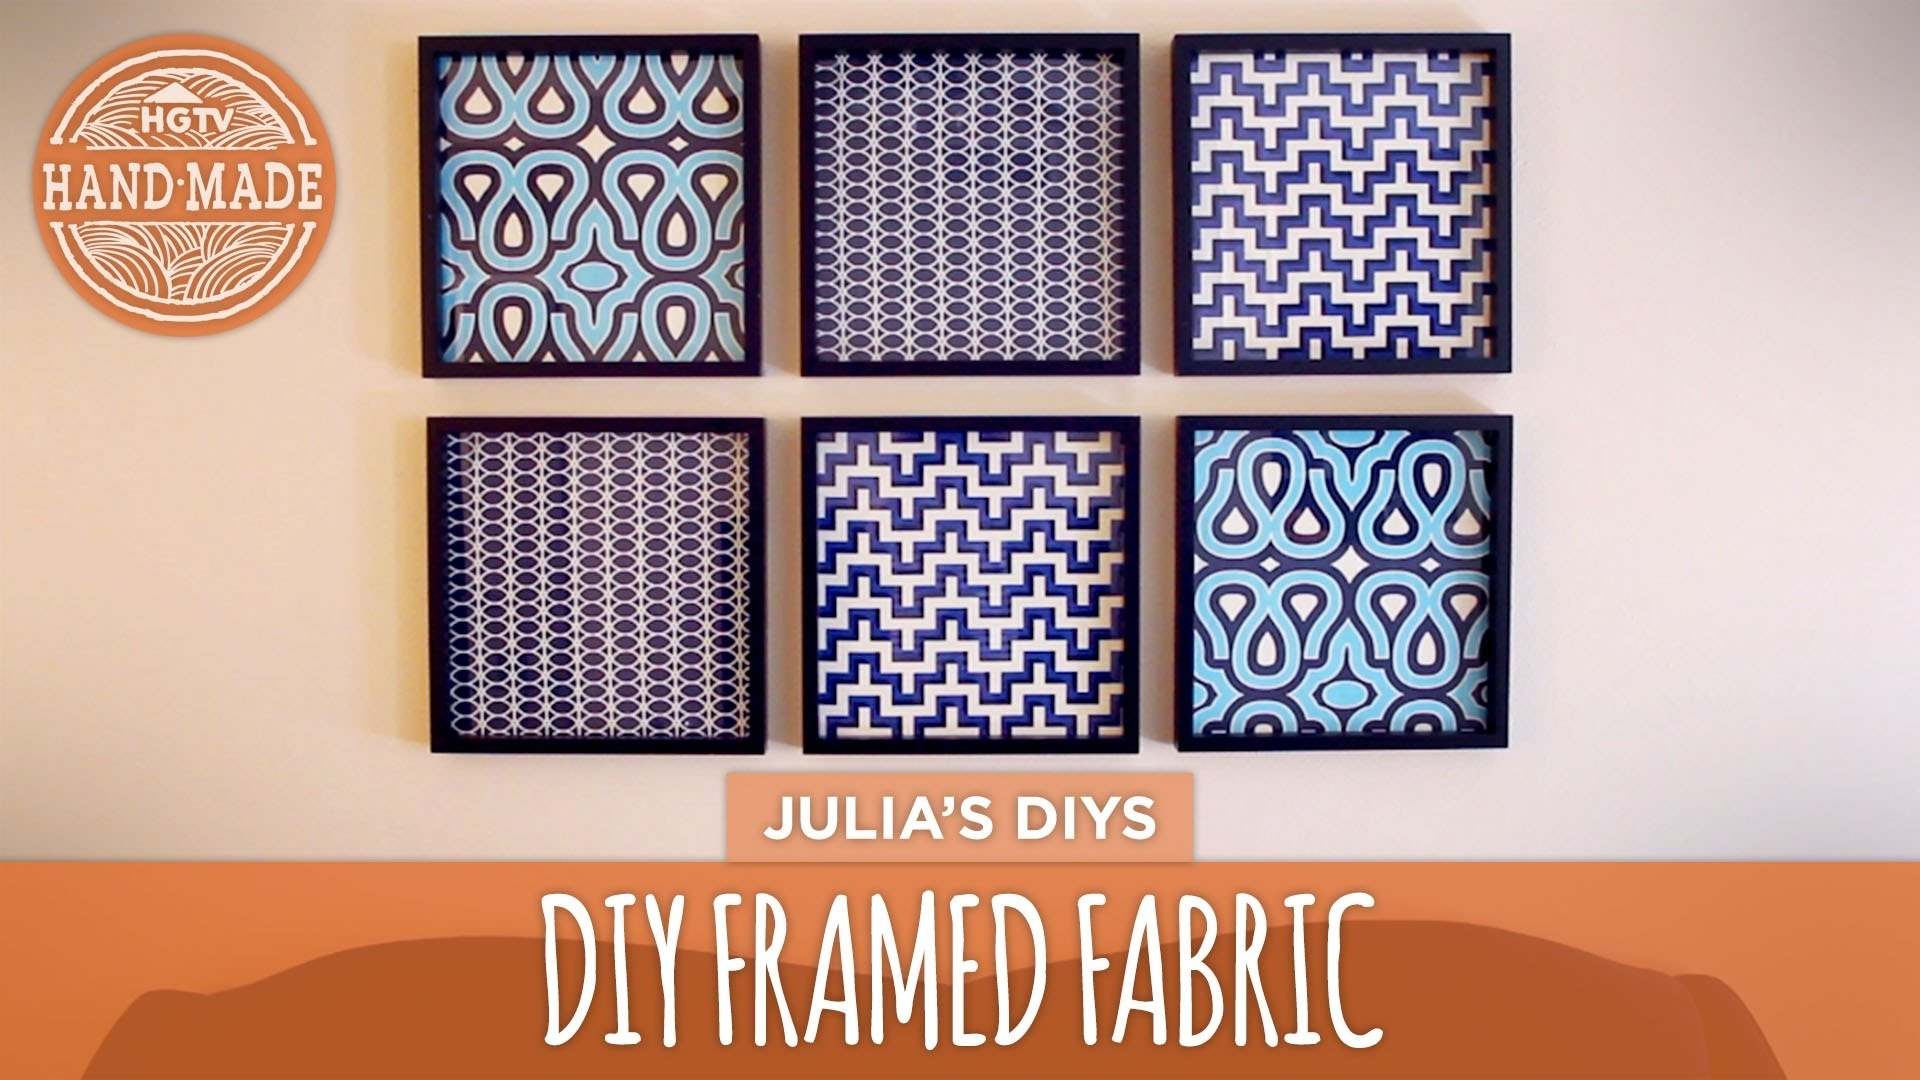 Diy Framed Fabric Gallery Wall - Hgtv Handmade - Youtube with 2018 Batik Fabric Wall Art